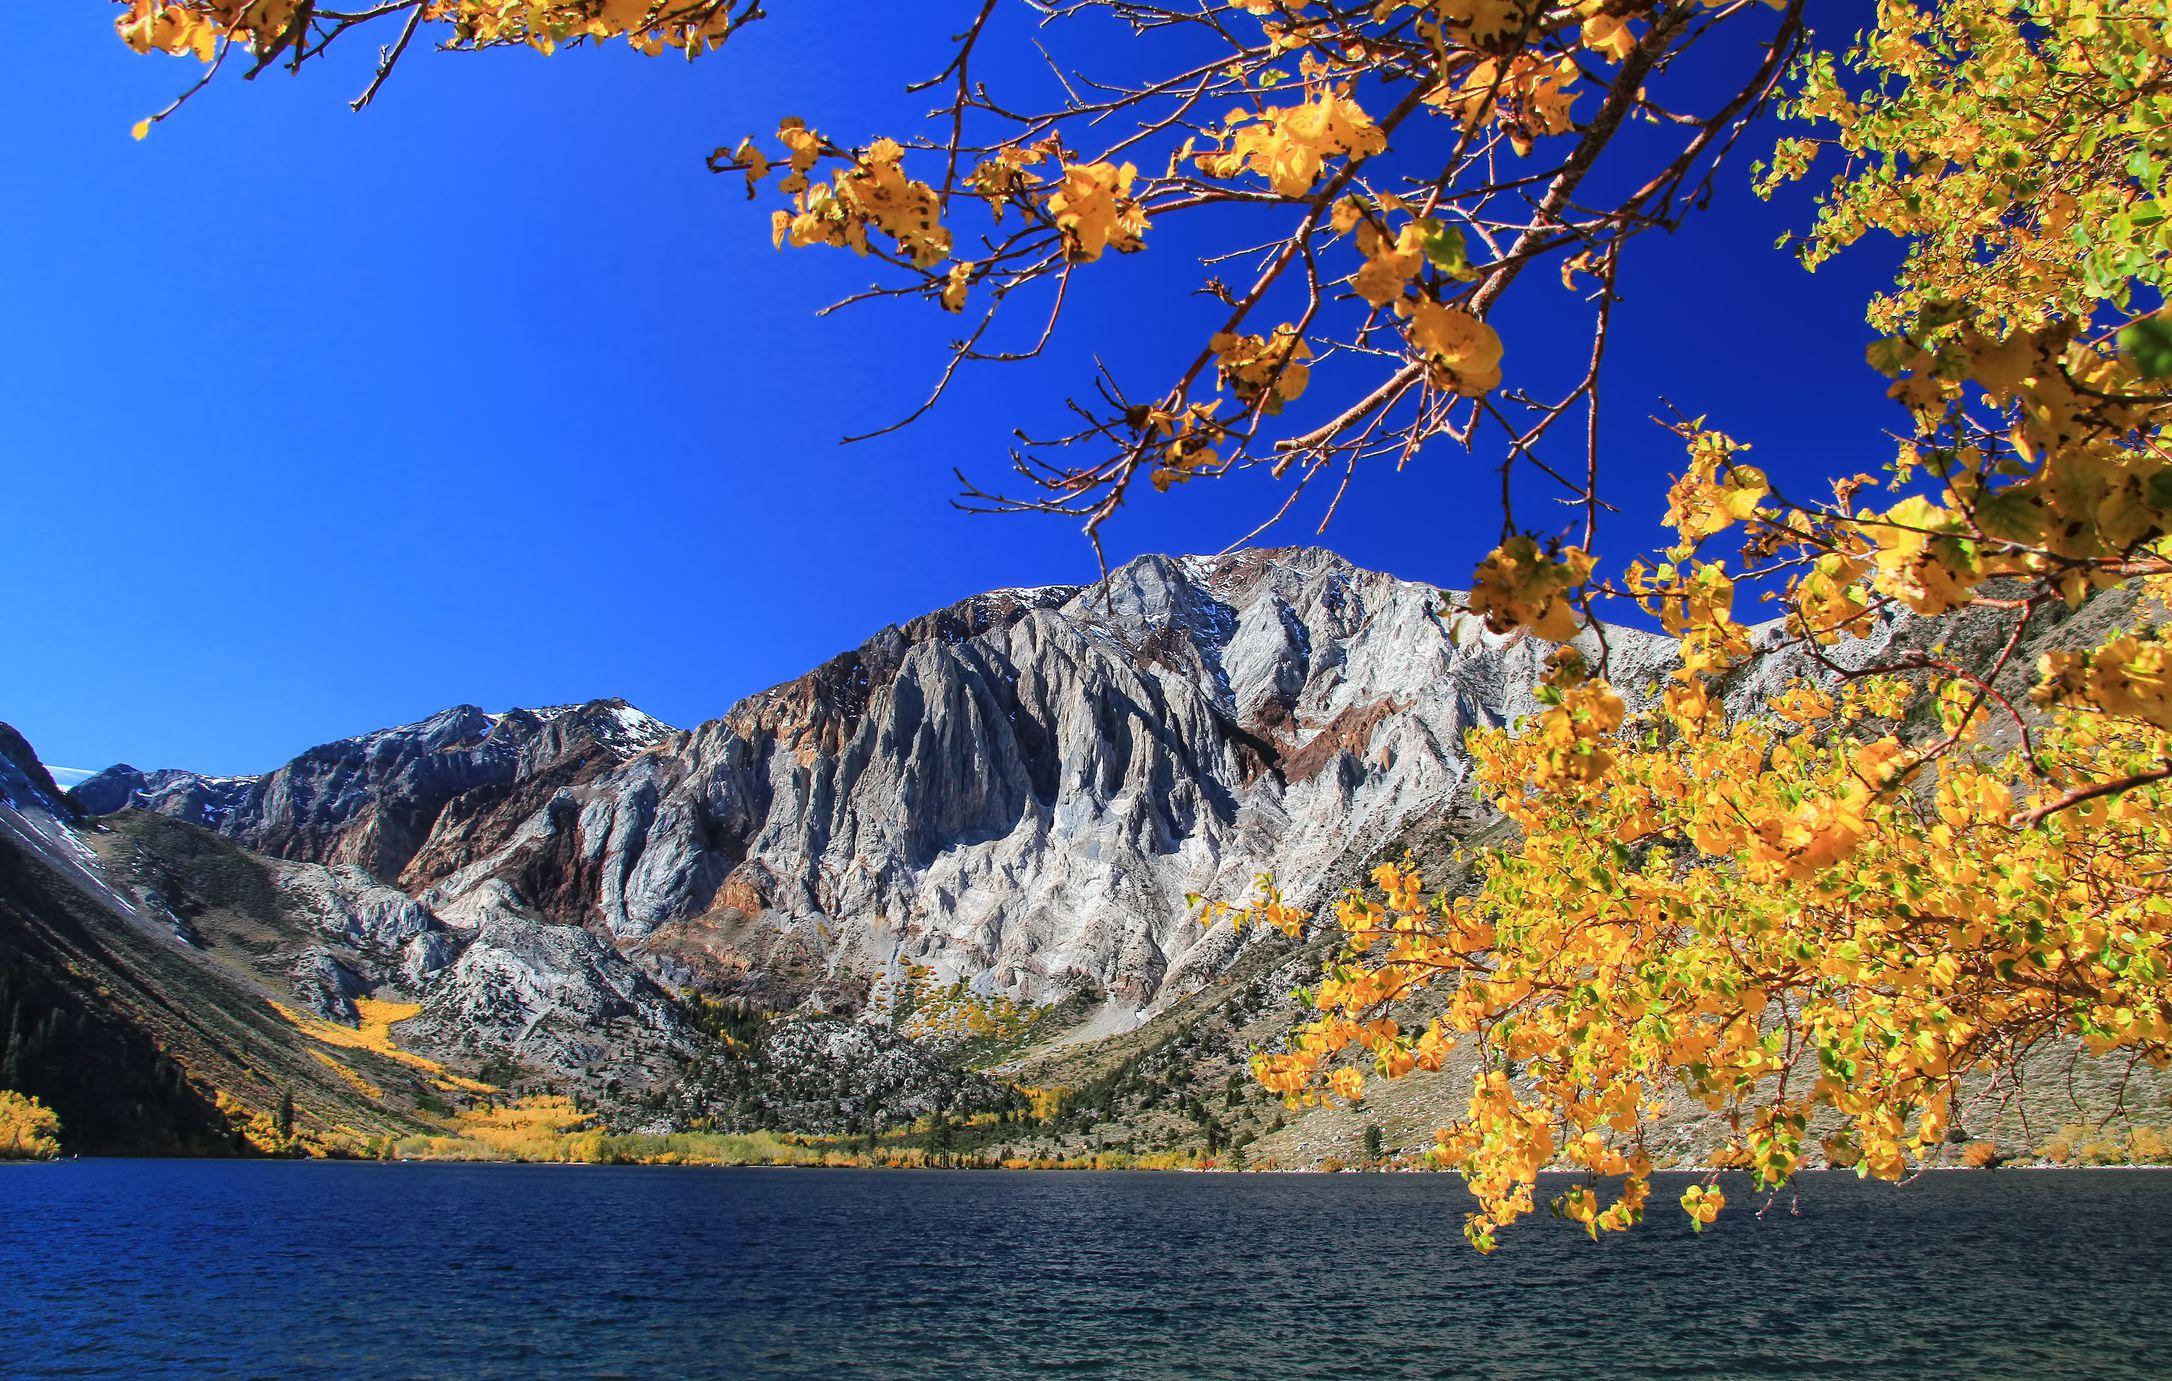 Fall Foliage Drives In Northern California